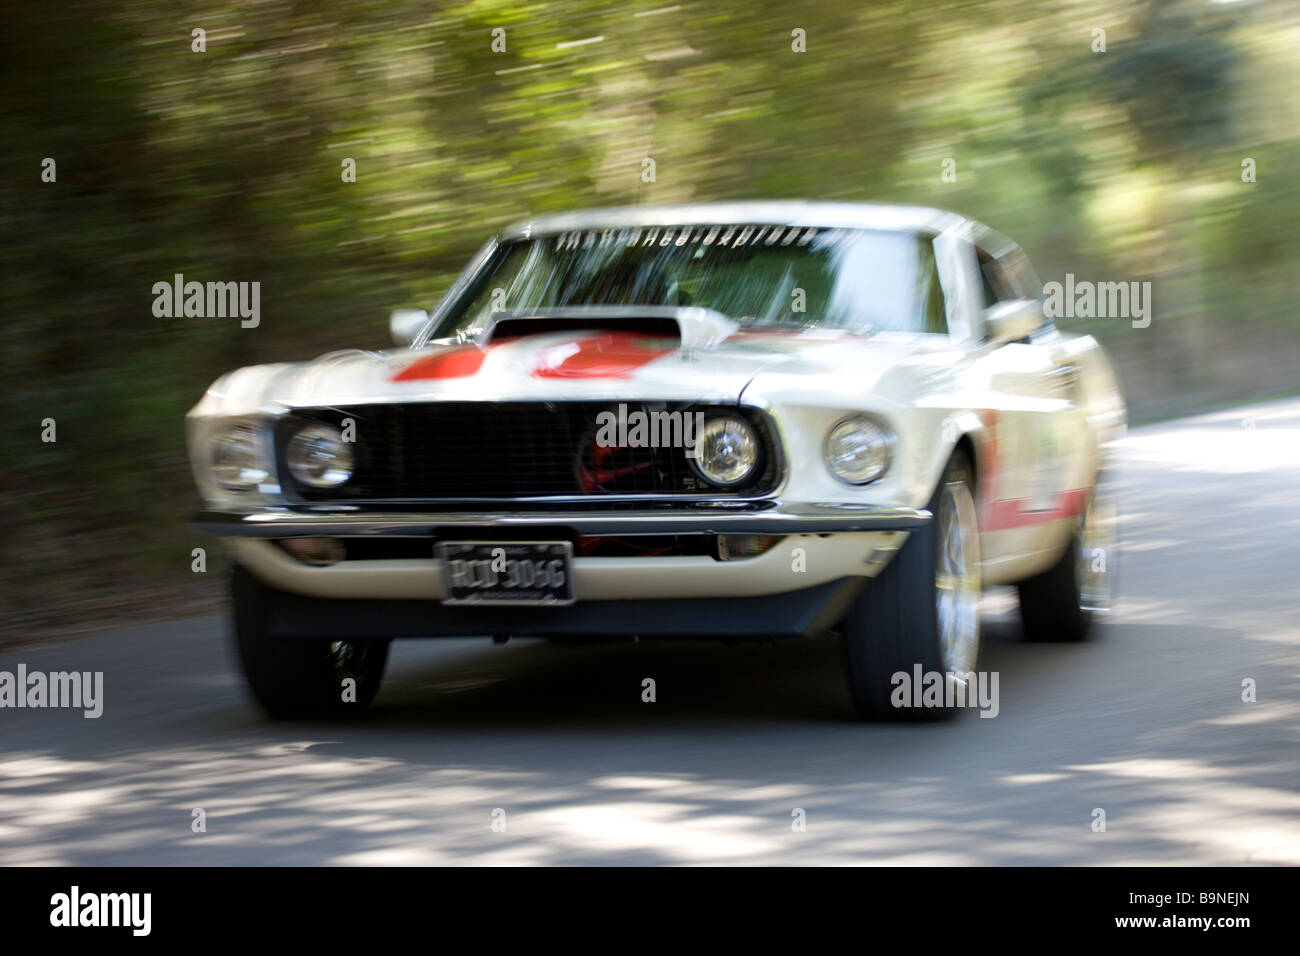 1969 Ford Mustang Mach 1 Stockfoto Bild 23214765 Alamy